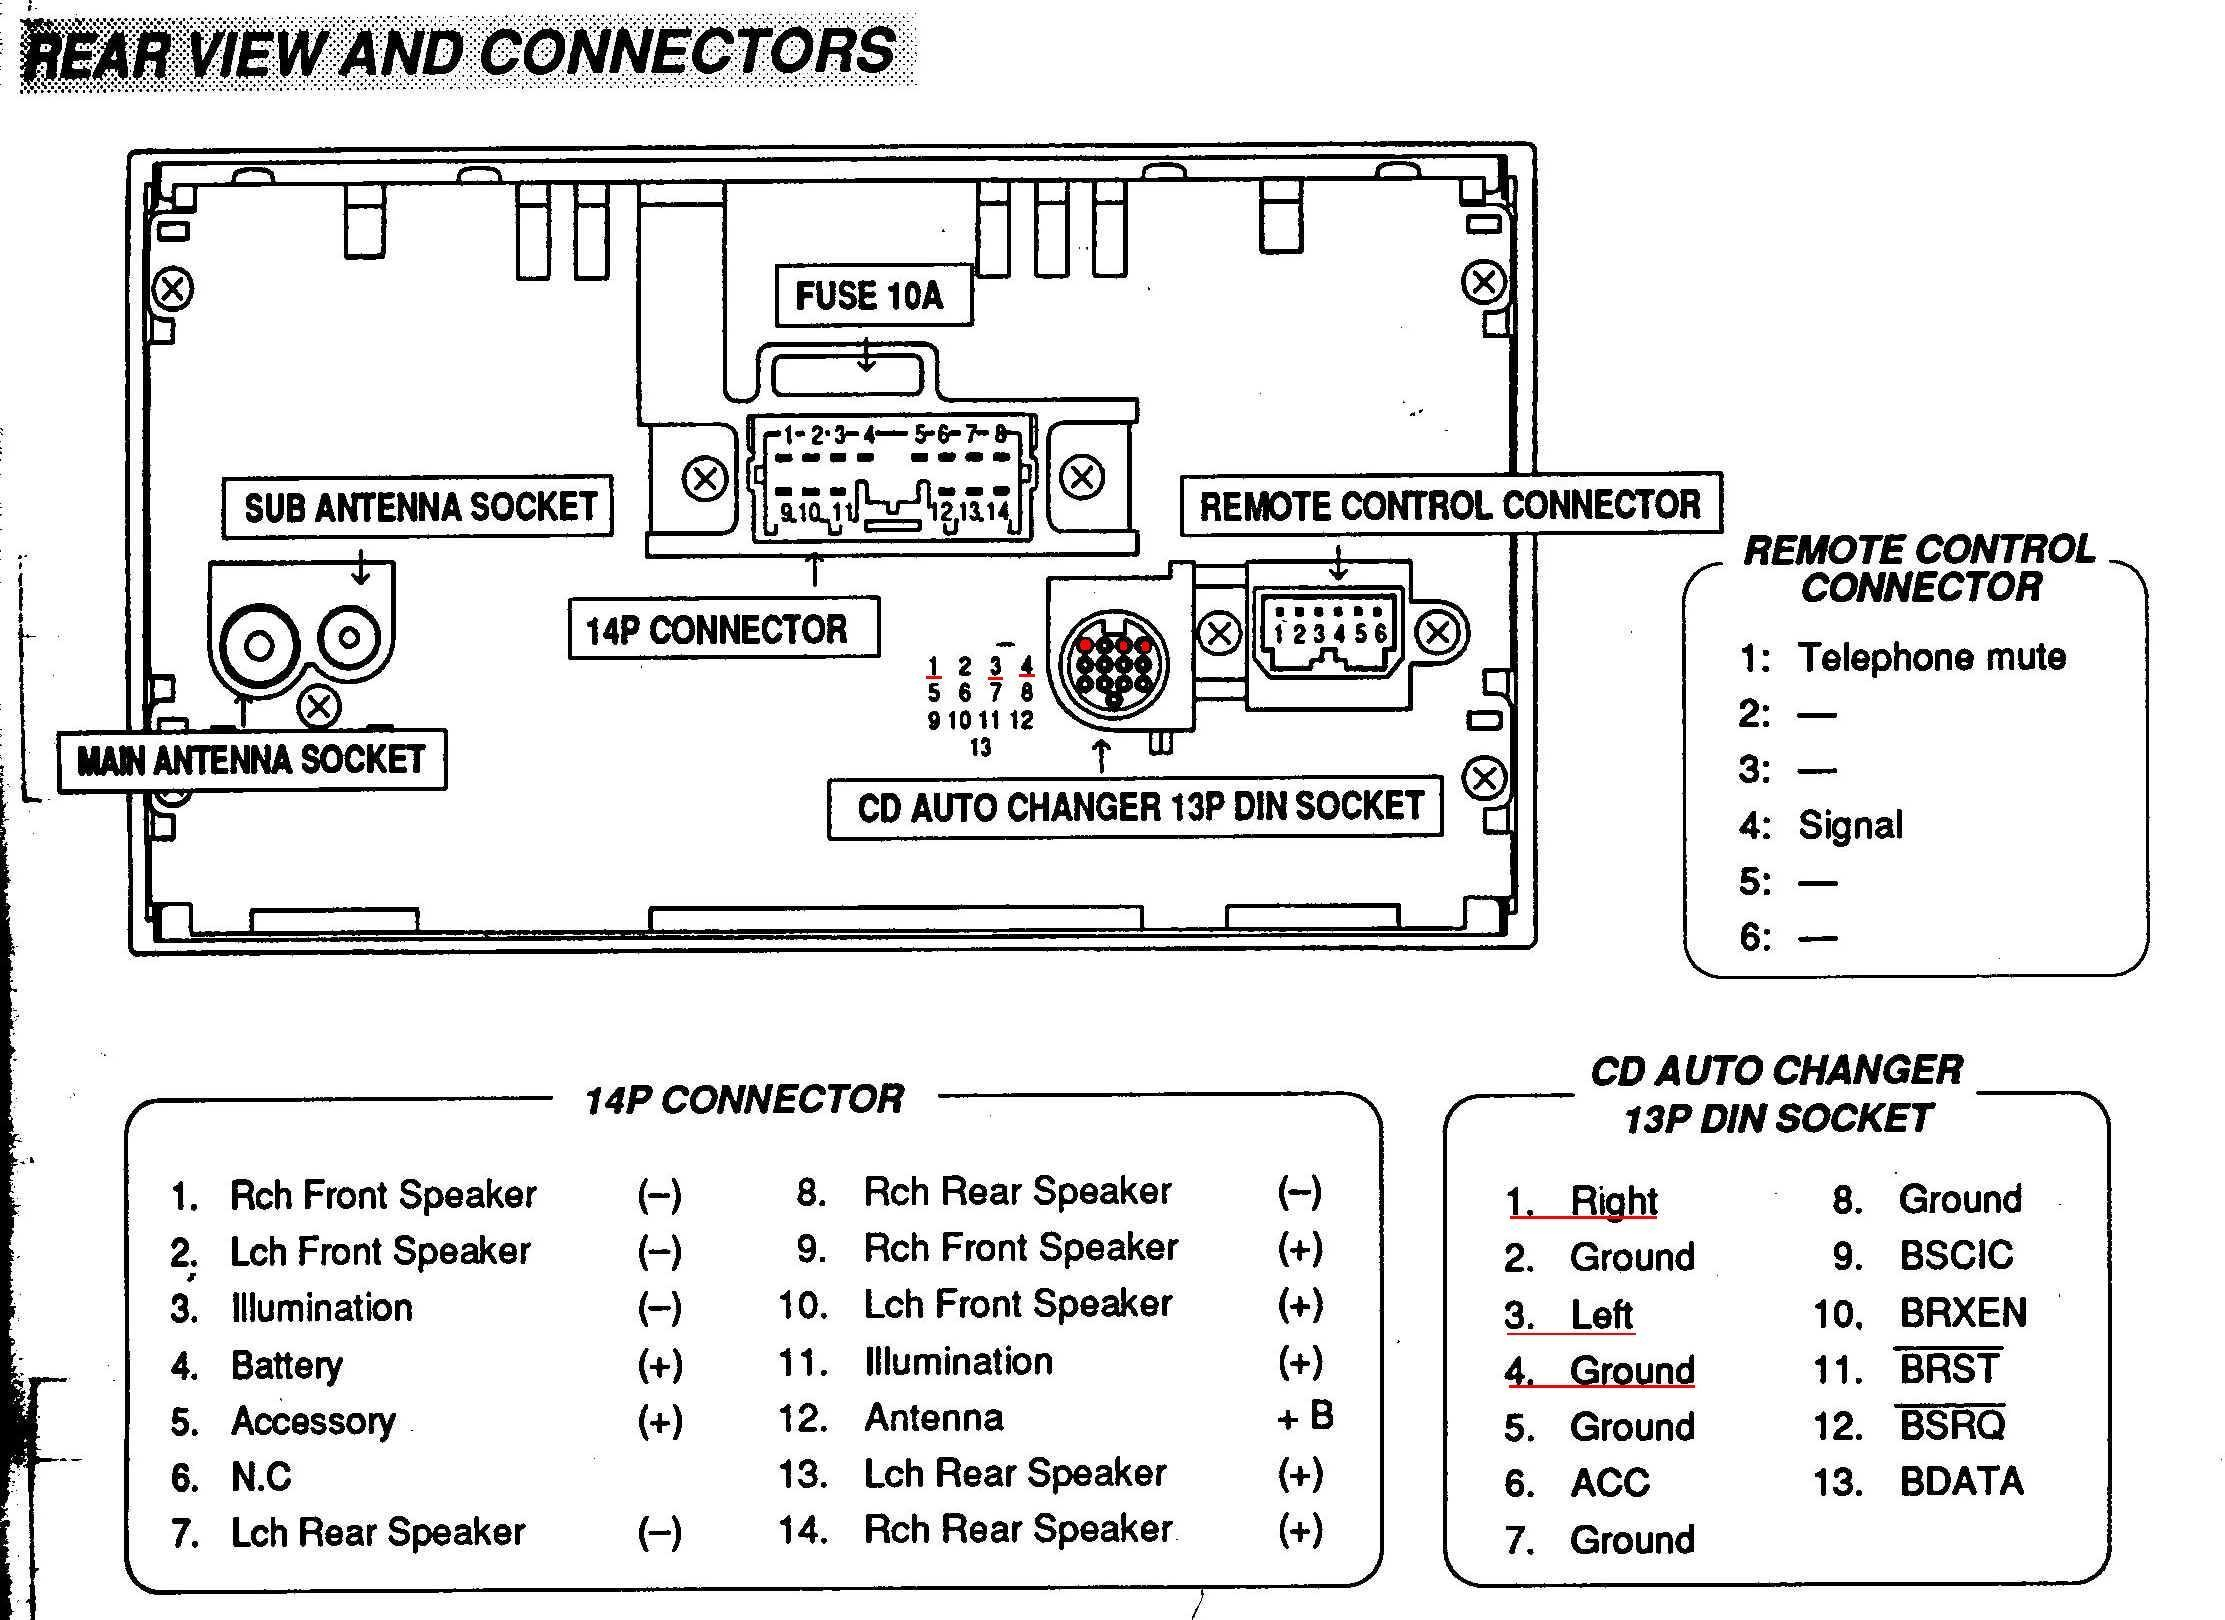 2000 Mitsubishi Eclipse Wiring Diagram Radio Wiring Diagram for Mitsubishi Montero Sport at 1995 Jeep Grand Of 2000 Mitsubishi Eclipse Wiring Diagram